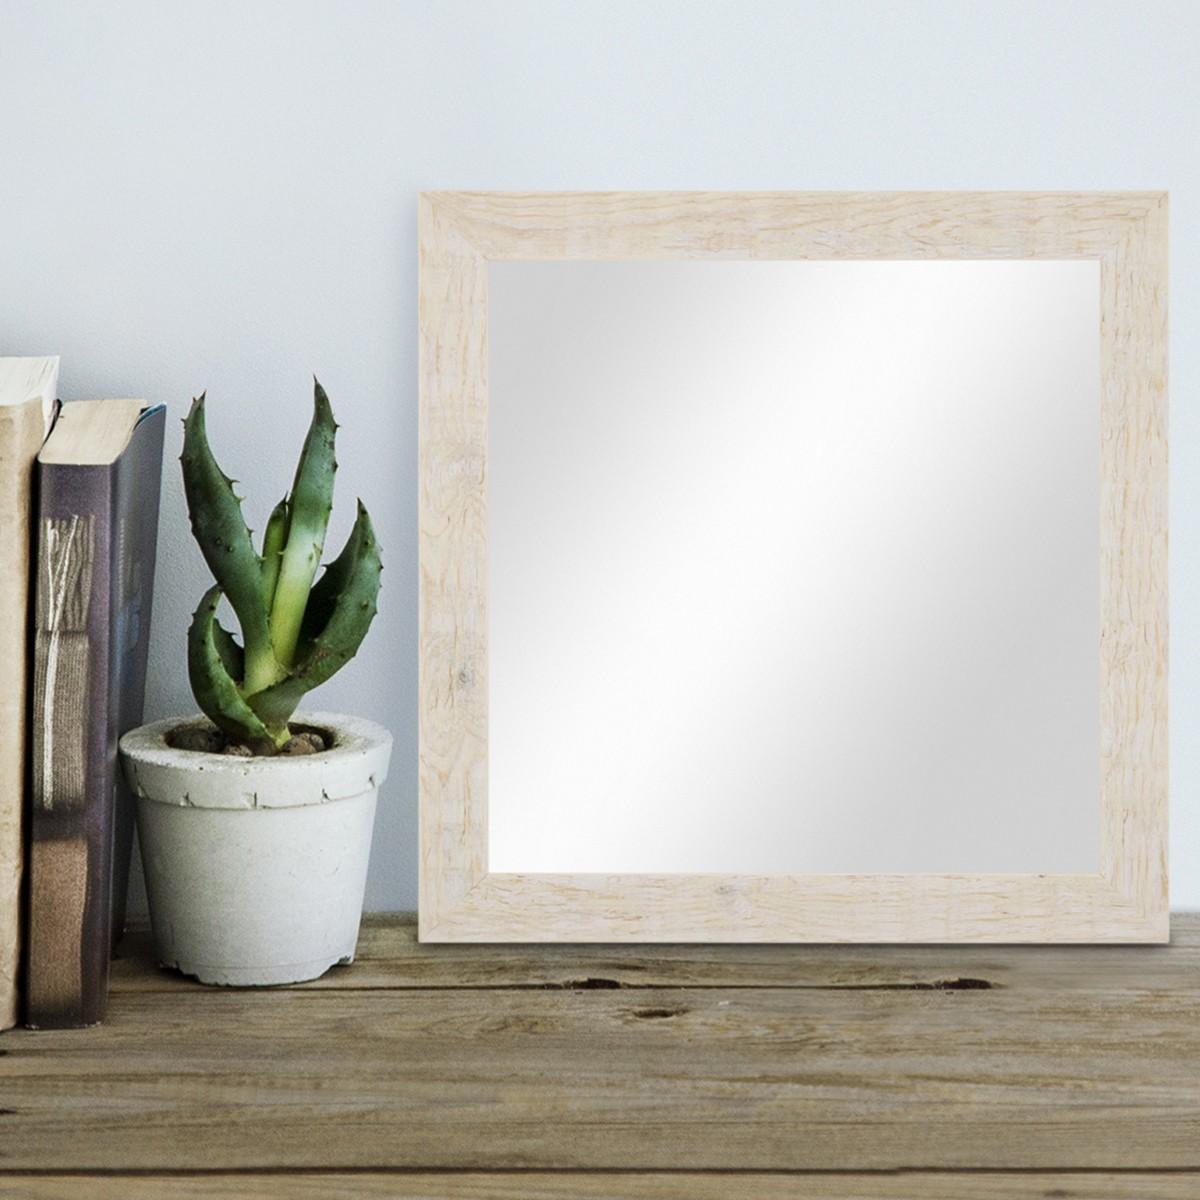 Wand-Spiegel 36x36 cm im Massivholz-Rahmen Strandhaus-Stil Rustikal ...